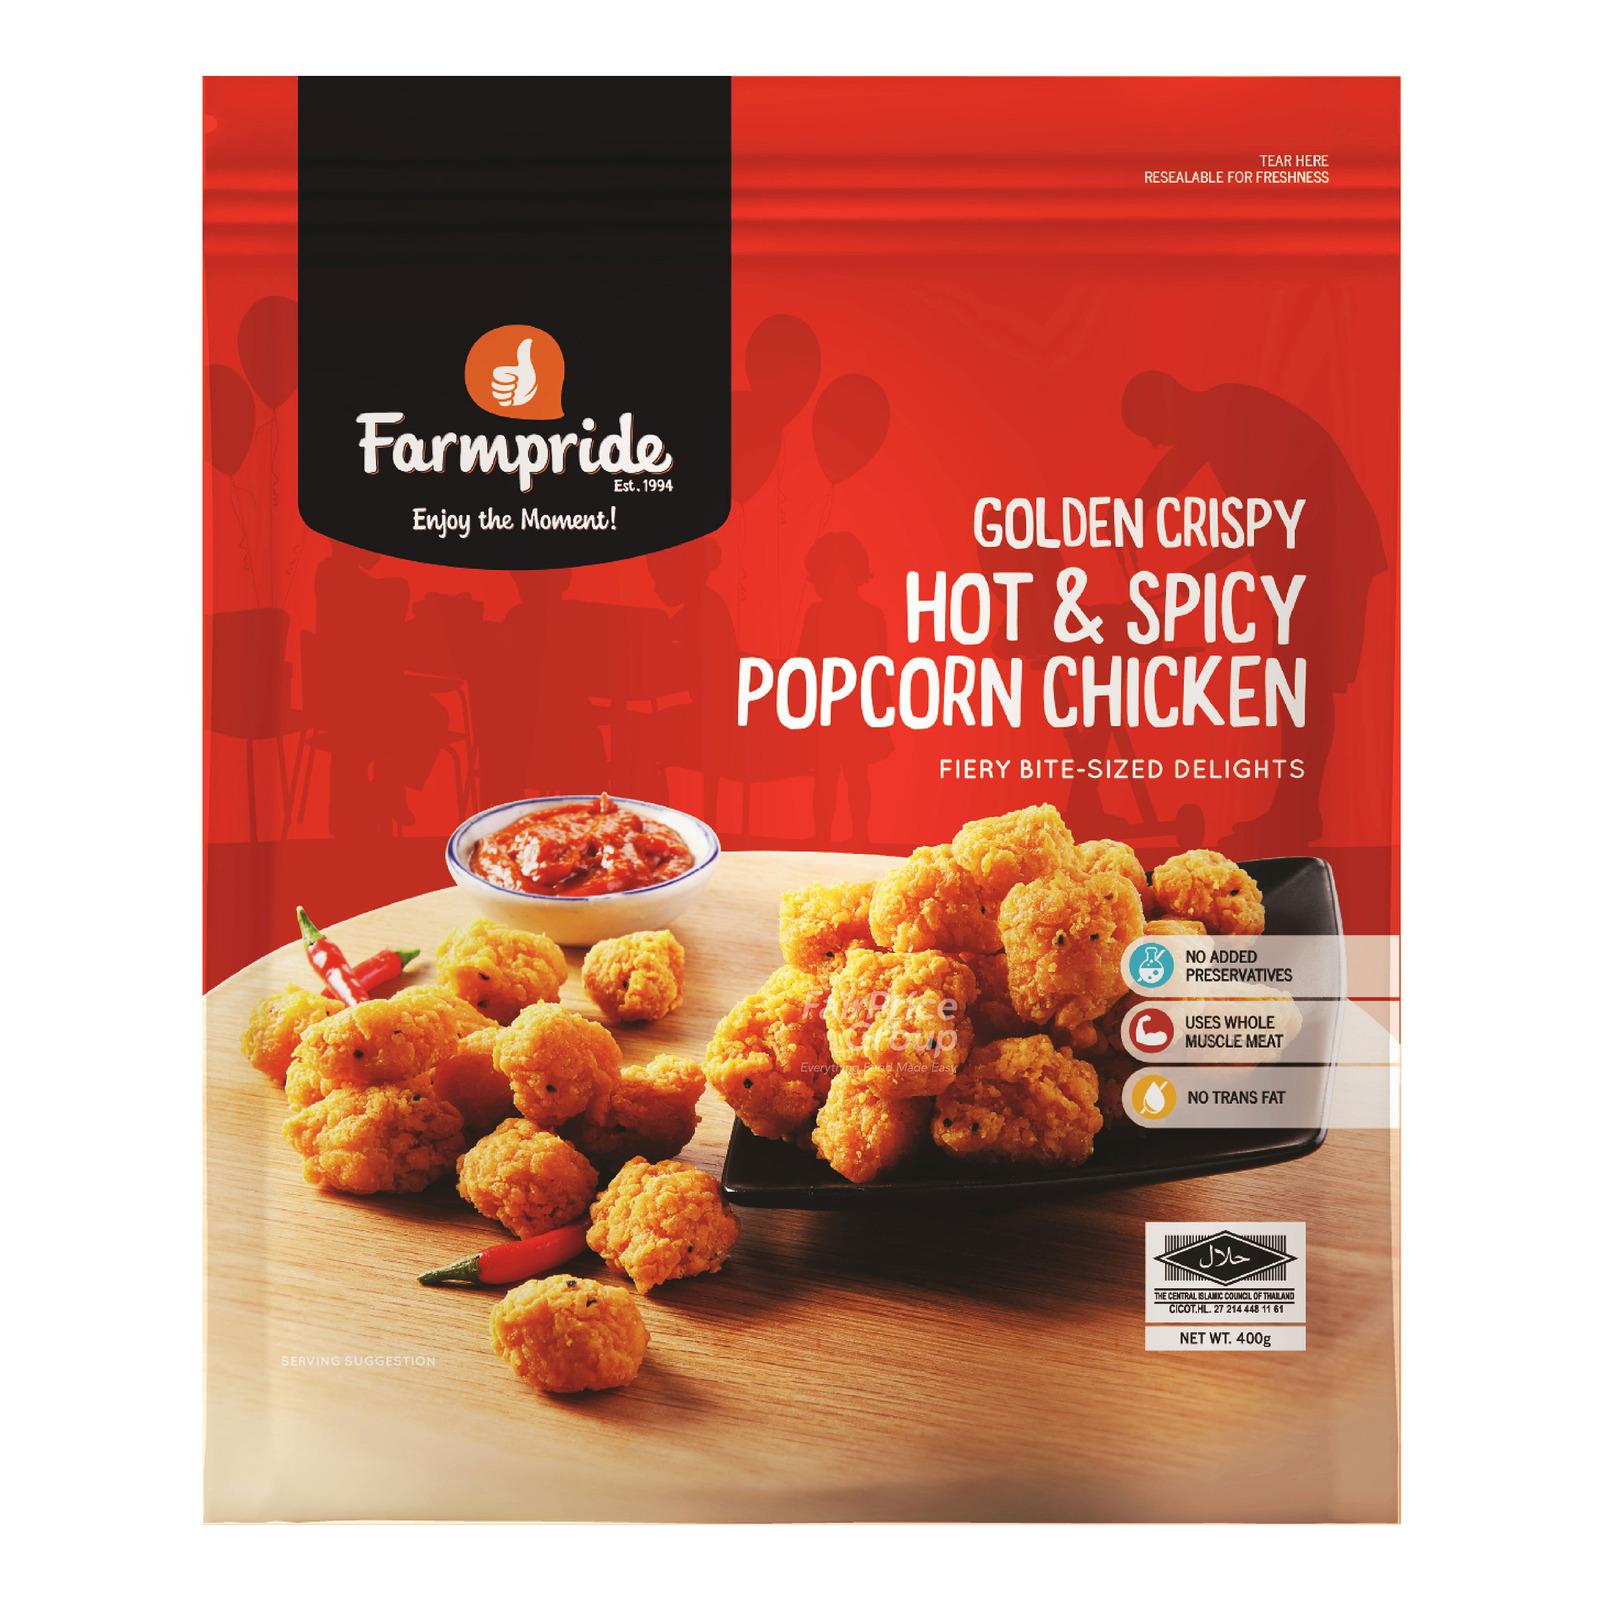 Farmpride Frozen Golden Crispy Popcorn Chicken - Hot & Spicy